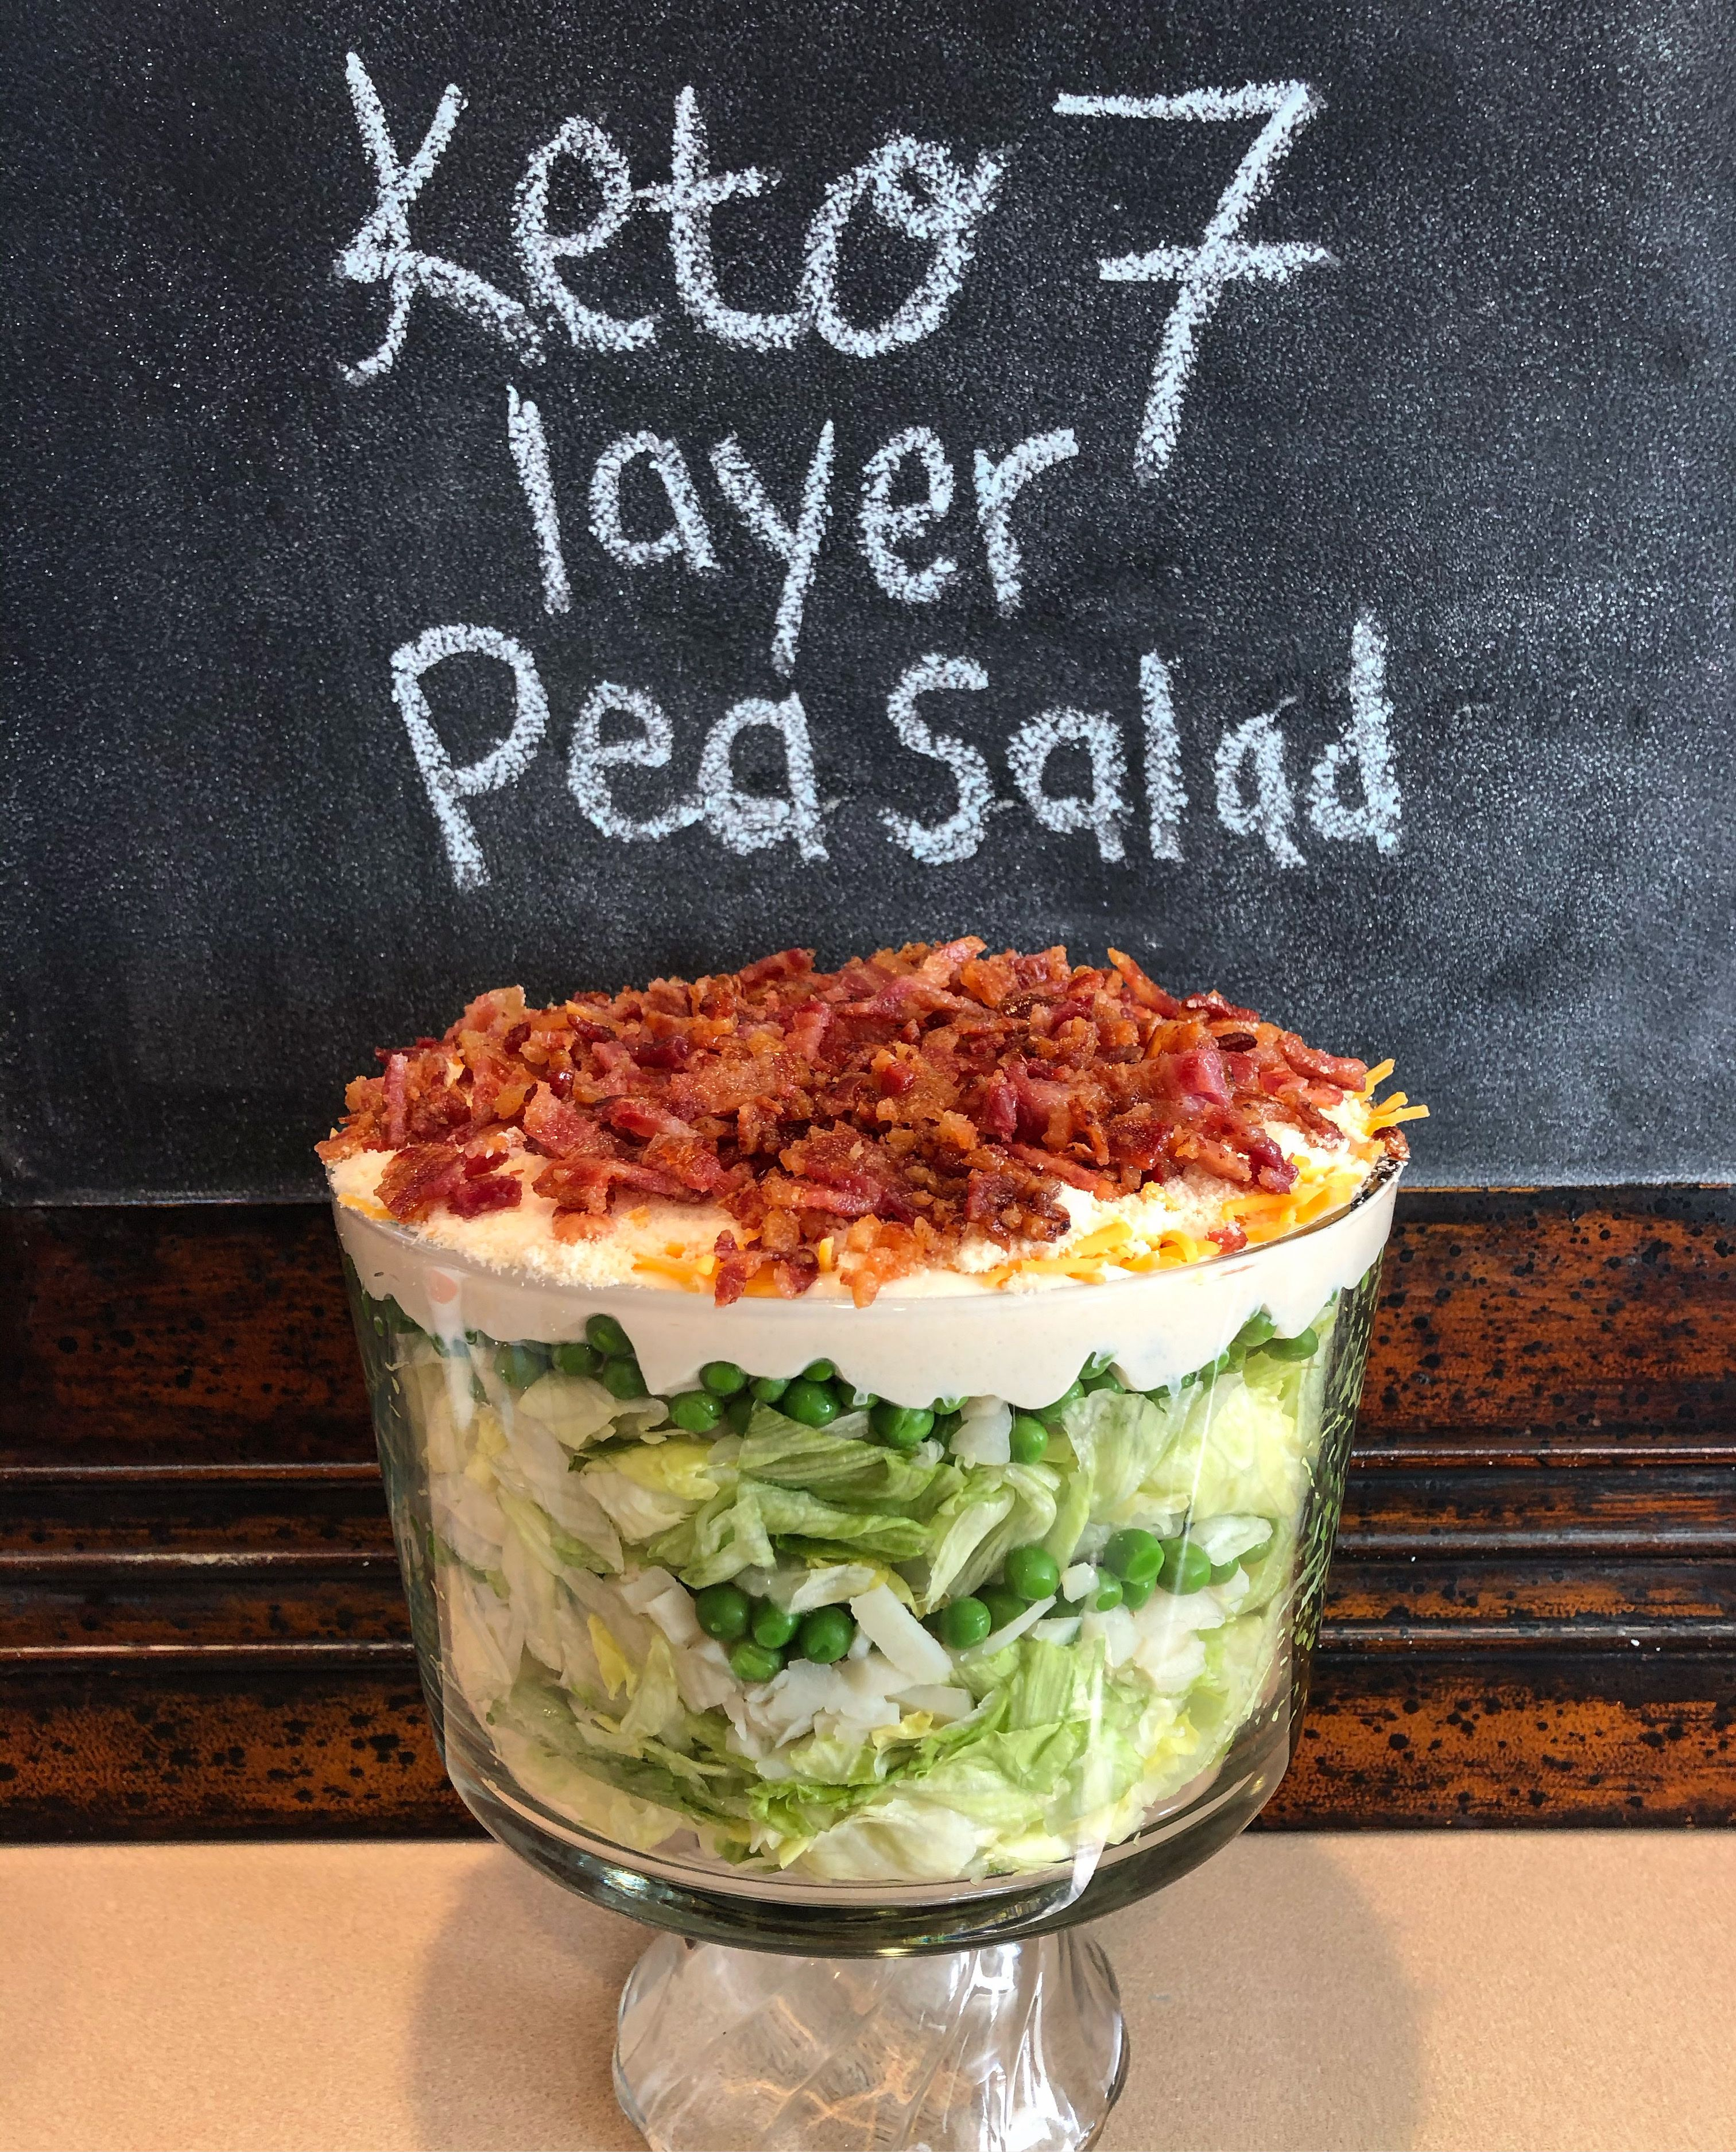 Keto 7 Layer Pea Salad Layered Salad With Peas Pea Salad Layered Salad